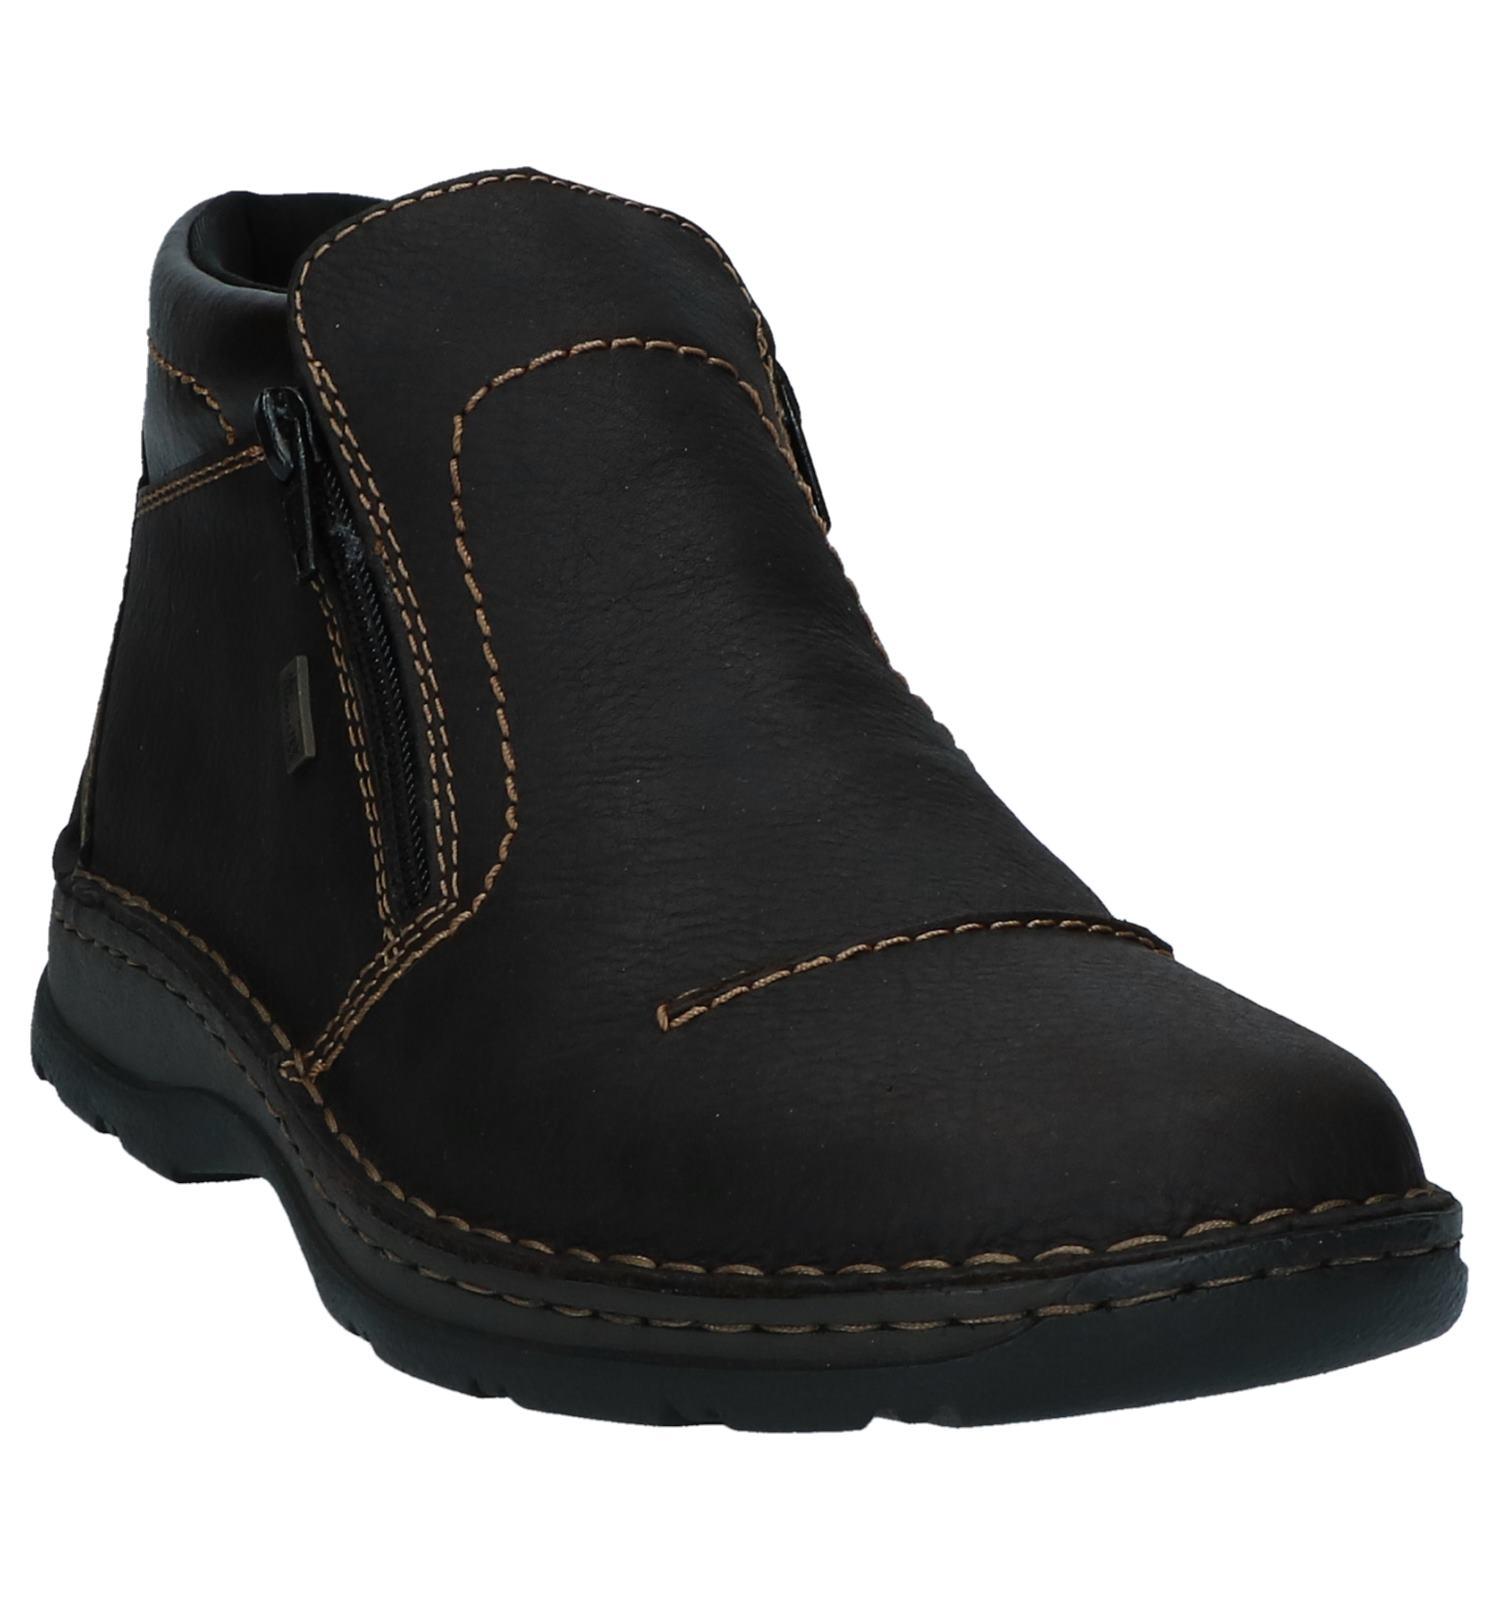 Rieker Boots Rieker Bruine Donker Rieker Boots Bruine Bruine Rieker Boots Donker Donker Donker Y6y7bvfIg